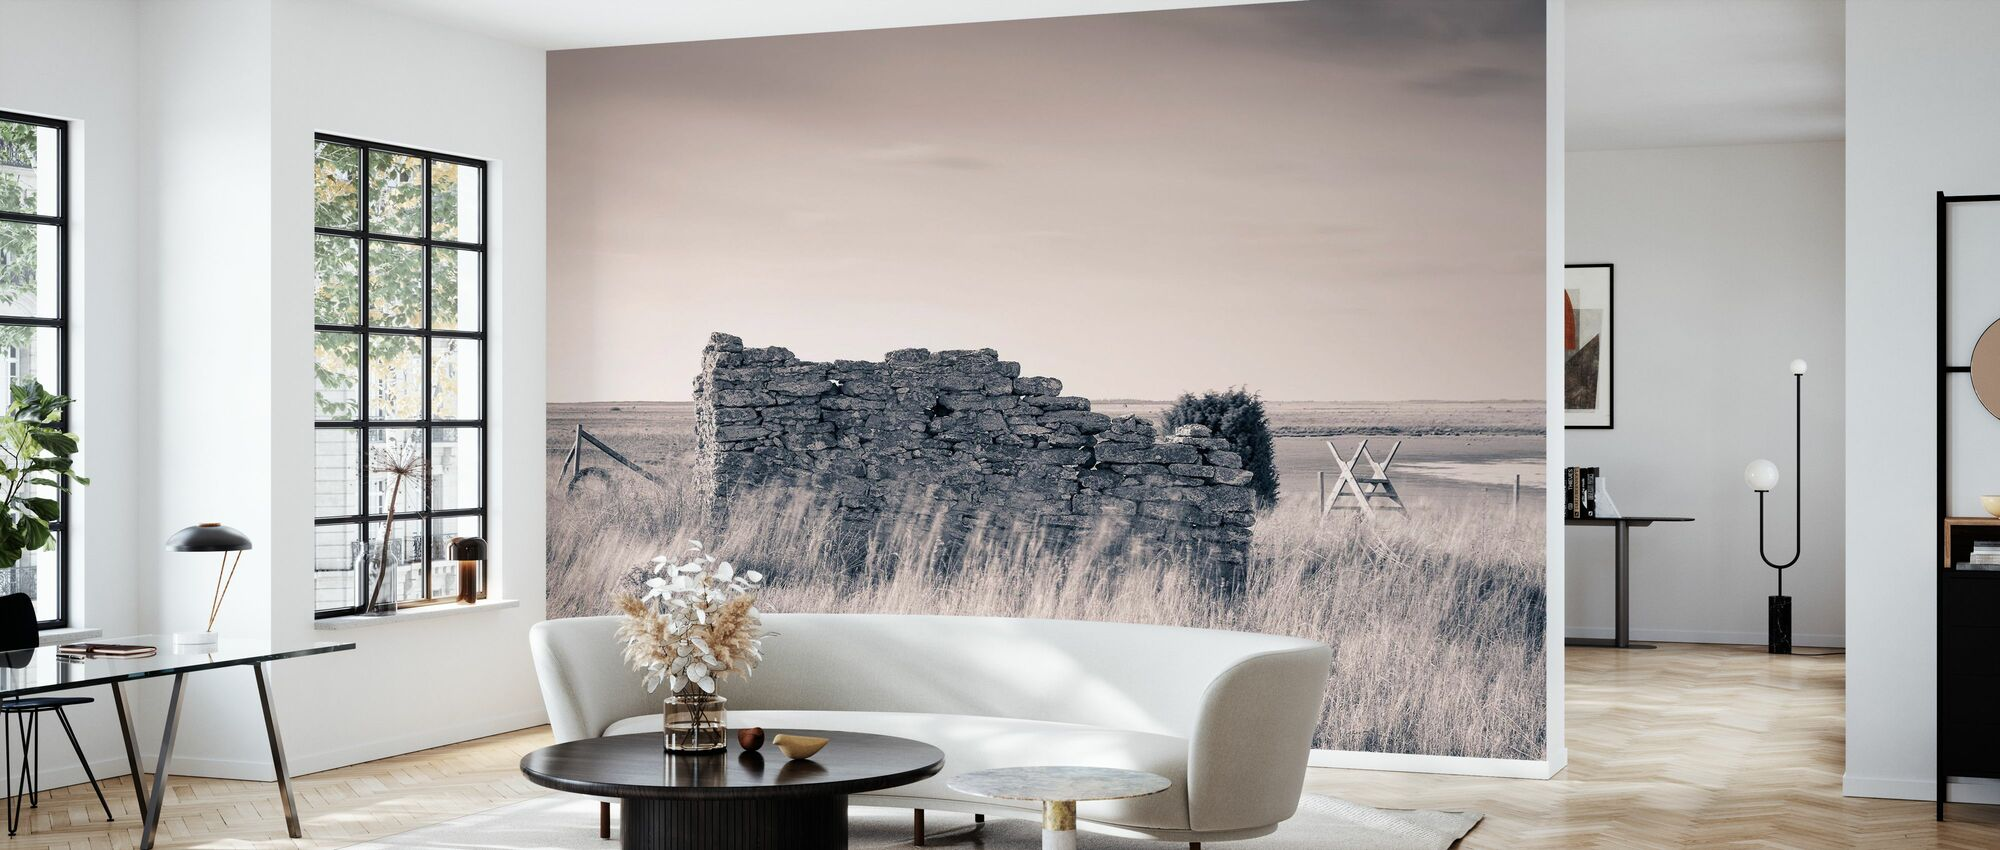 Old Ruin House - Wallpaper - Living Room